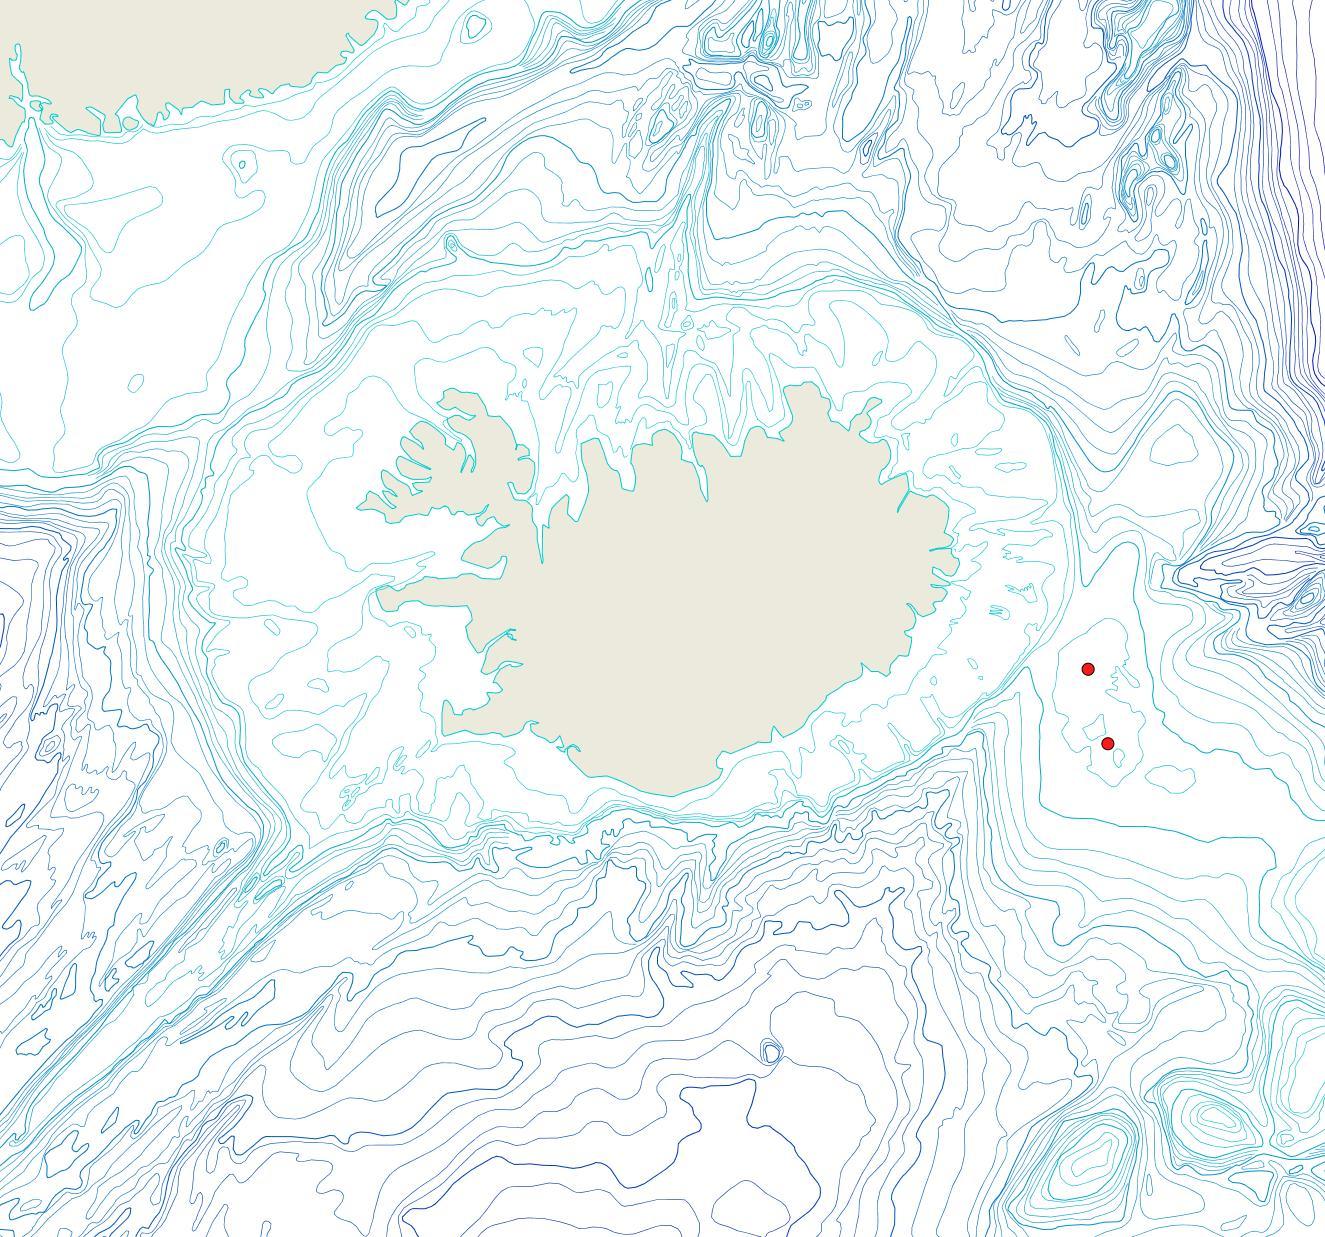 Útbreiðsla Marguetta lorea(Bioice samples, red dots)